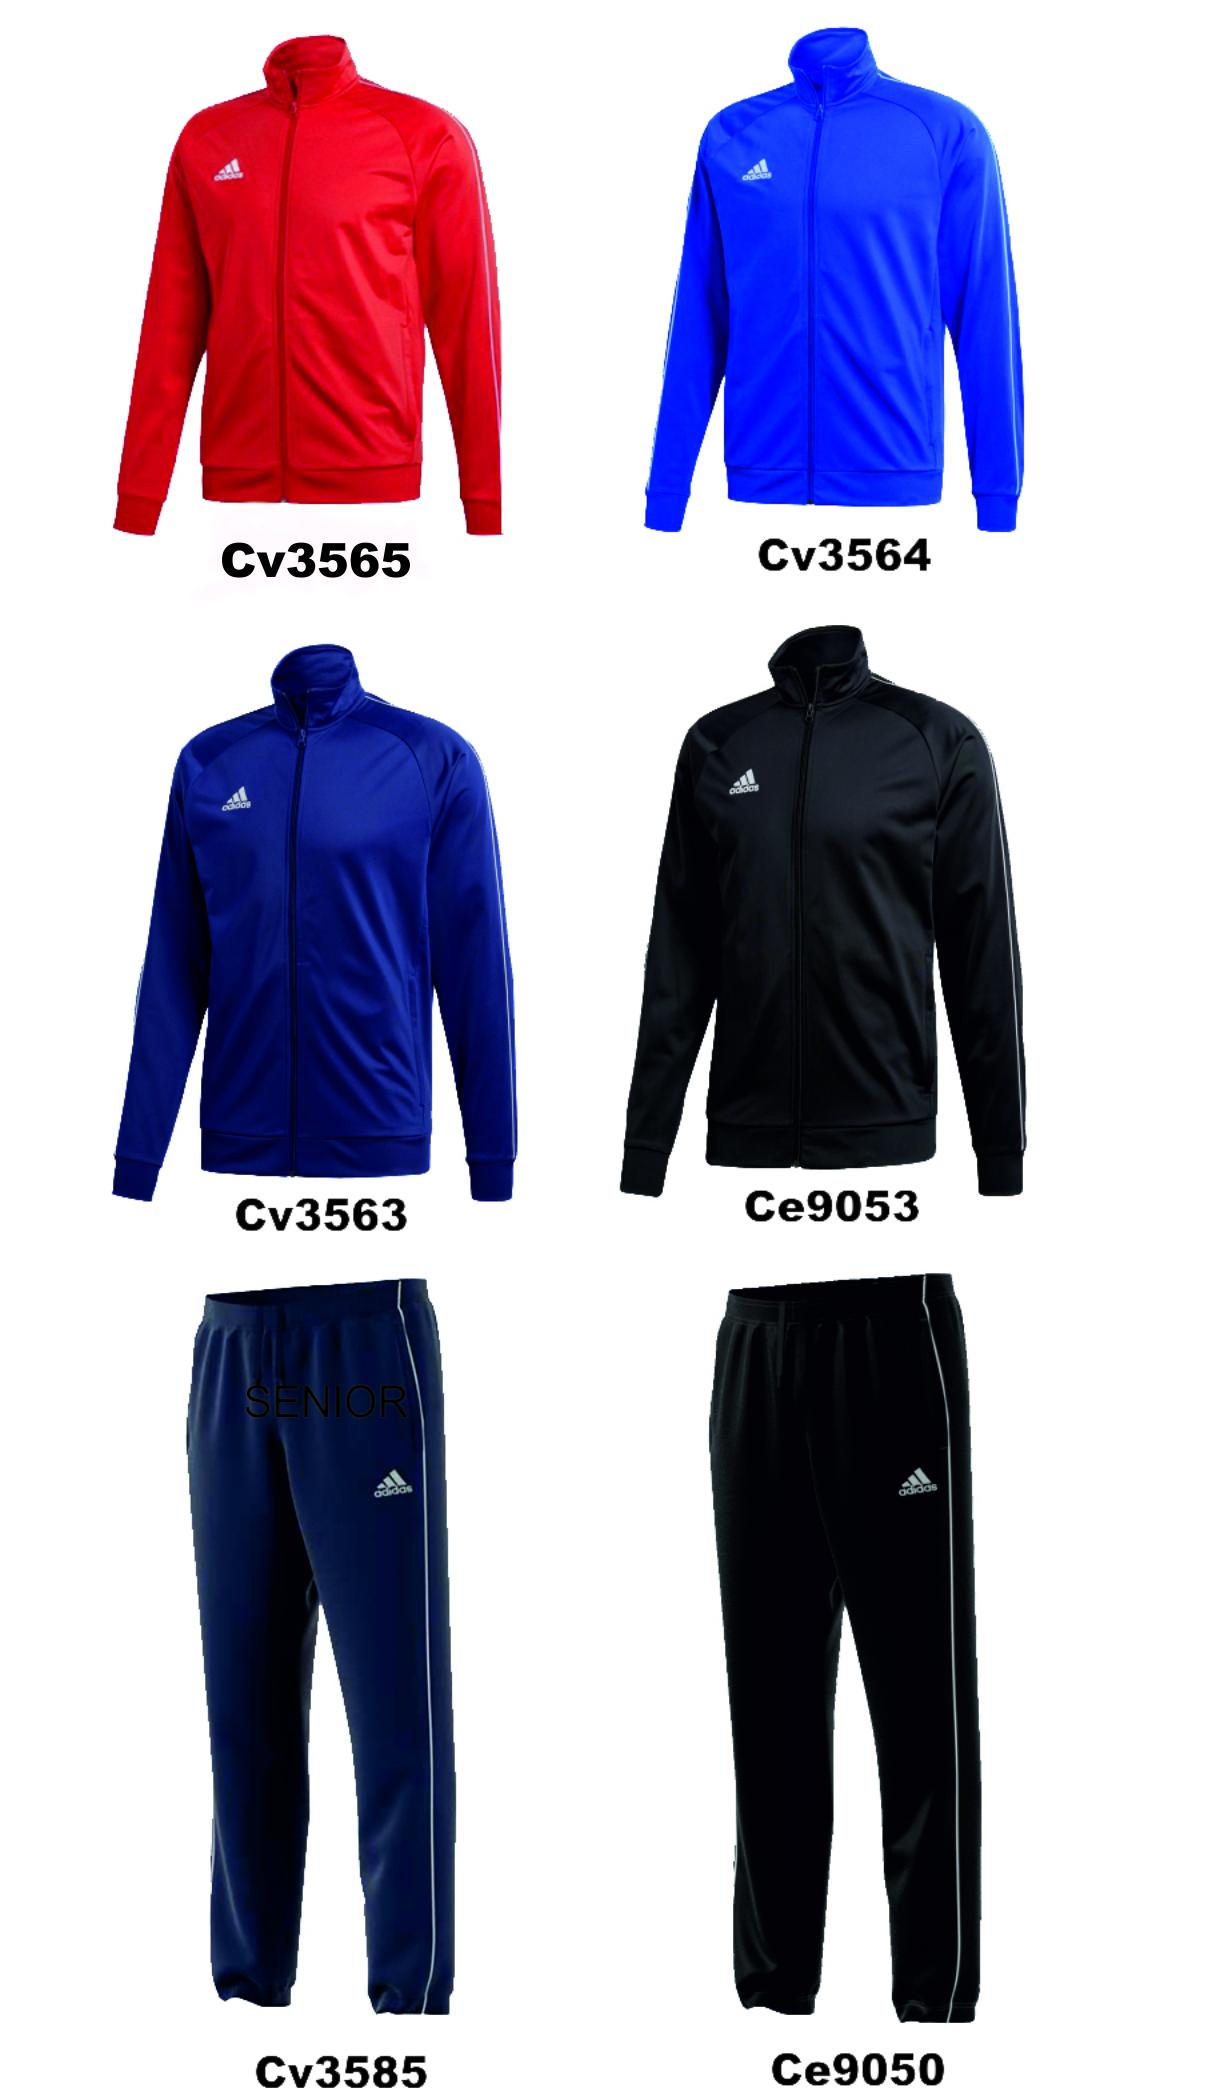 50d61546cdb20 MN Sport - Dres treningowy Adidas Core 18 PES JKT Senior - Sklep ...